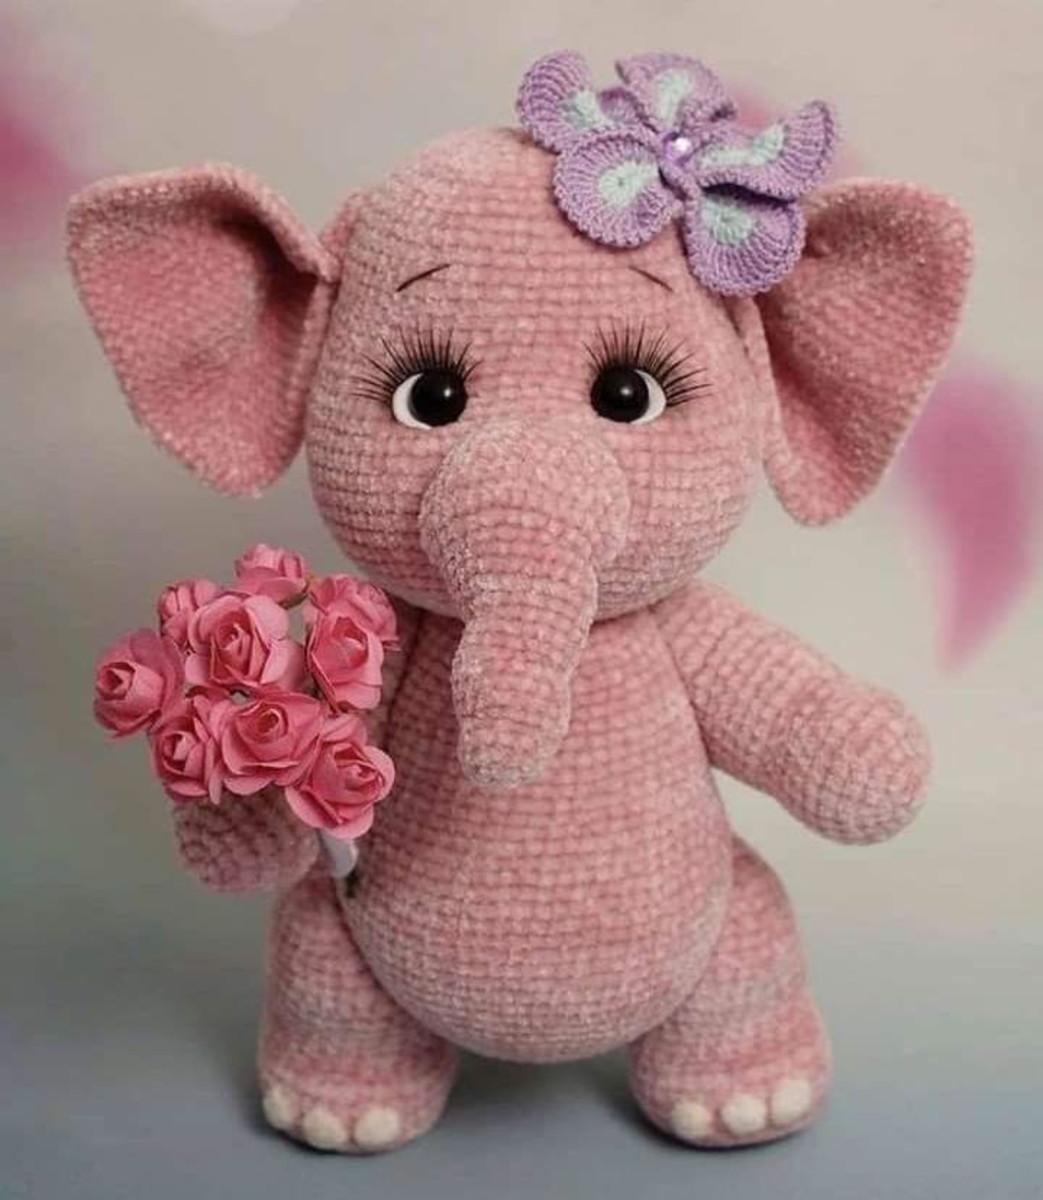 Amigurumi elefantinha | Elefante de crochê, Amigurumi de animais ... | 1200x1043